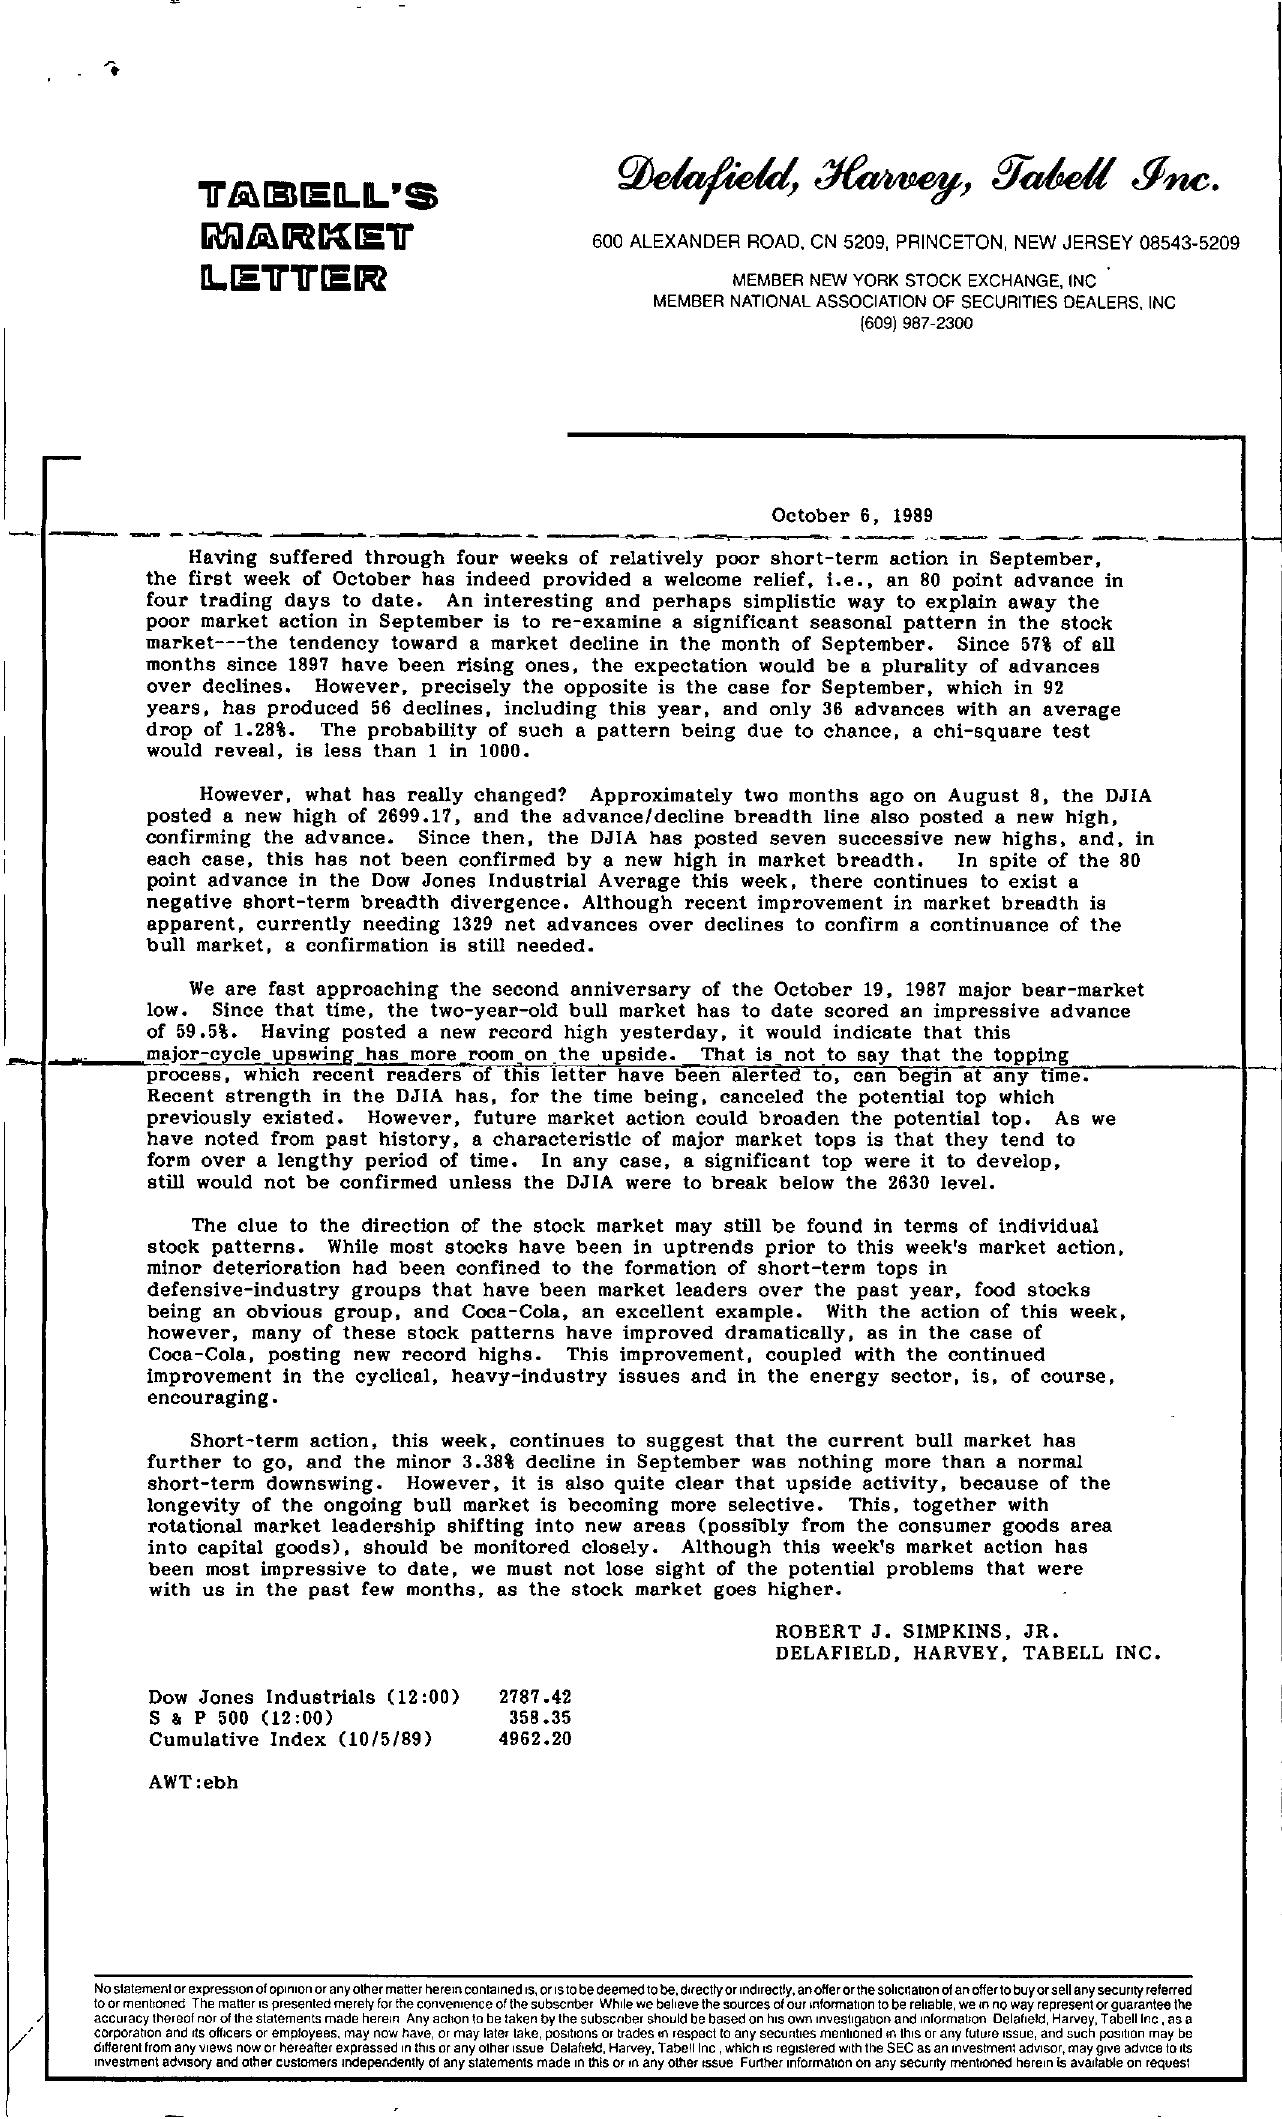 Tabell's Market Letter - October 06, 1989